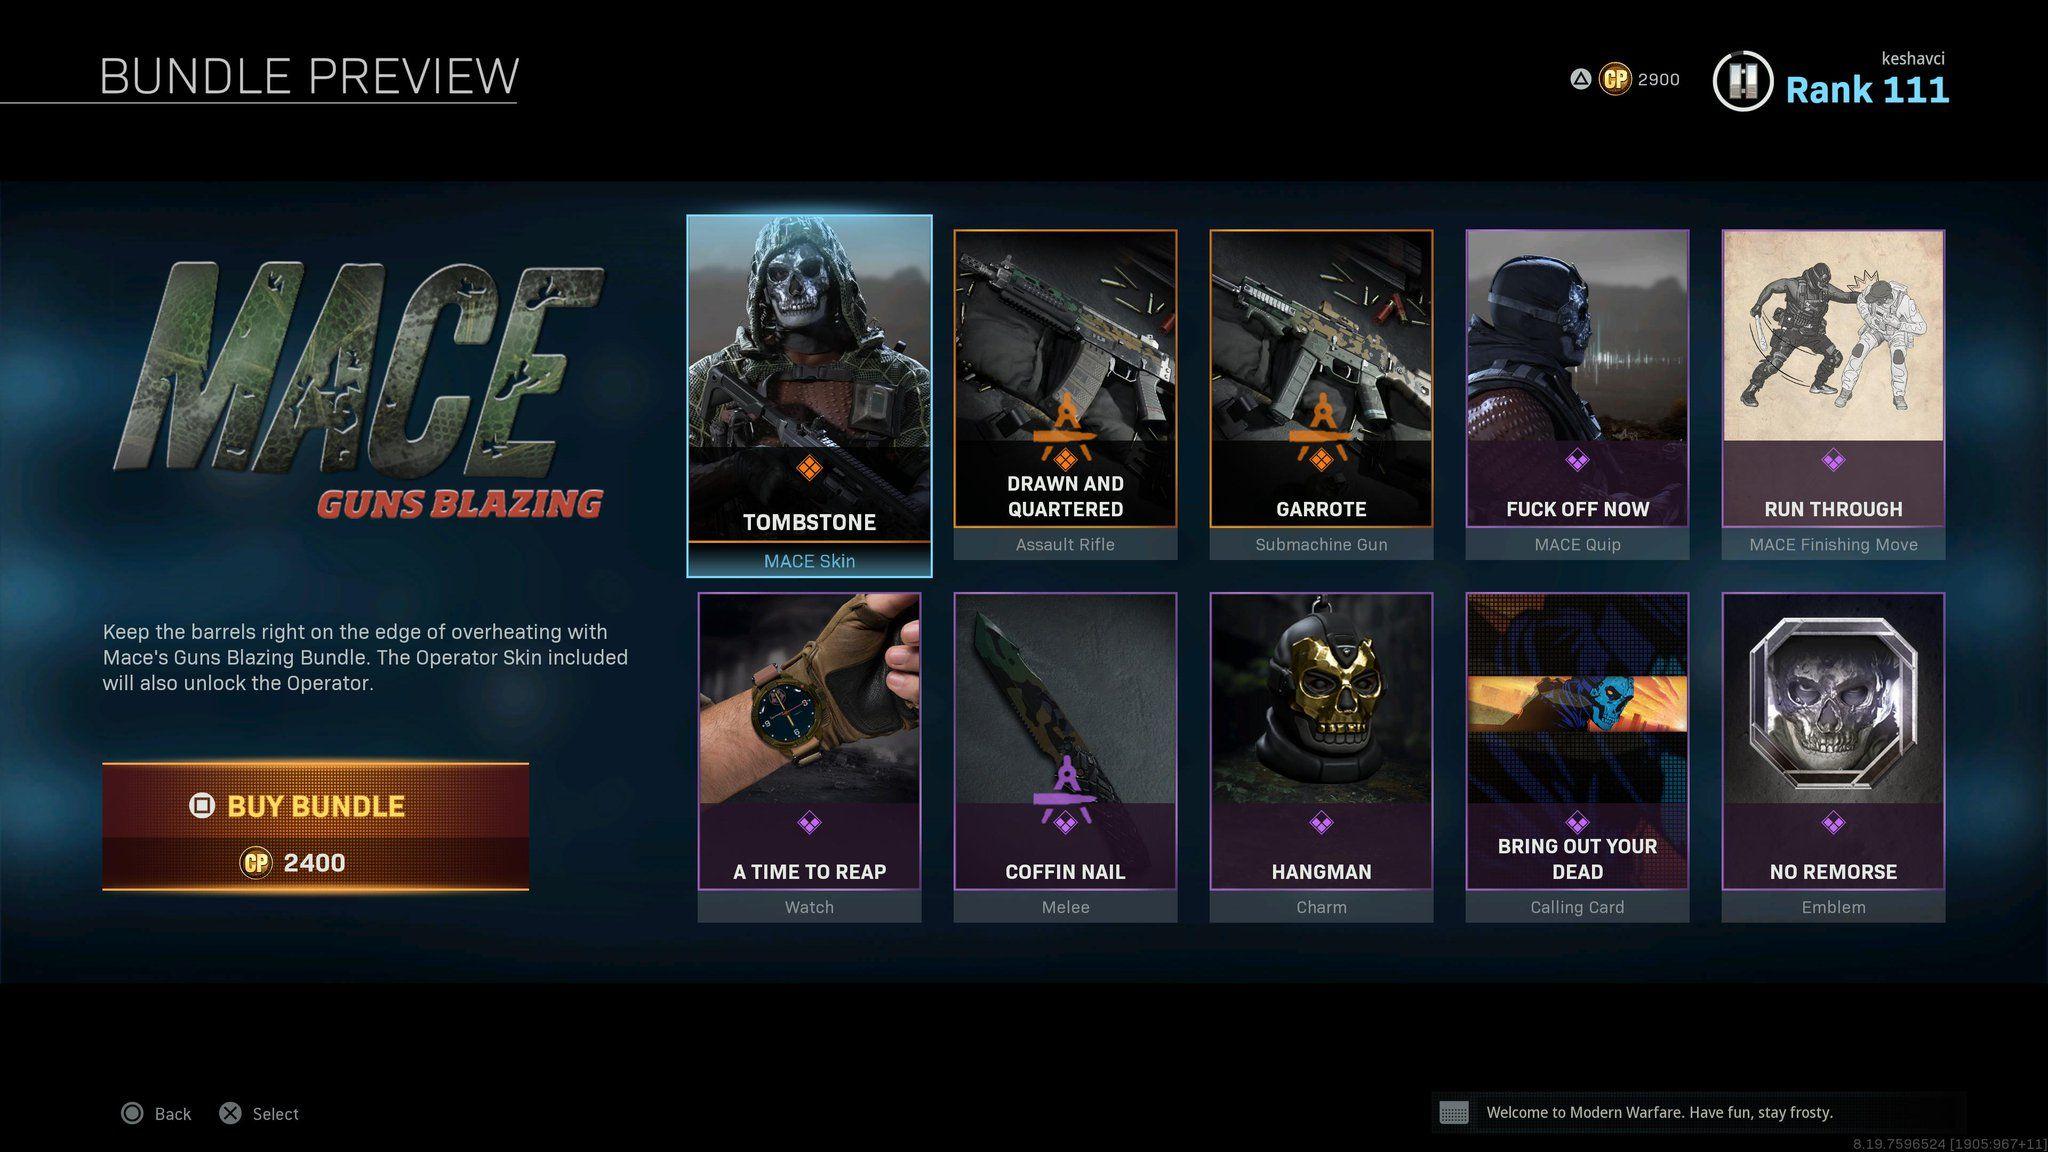 Call Of Duty News On Twitter Call Of Duty Modern Warfare New Skin